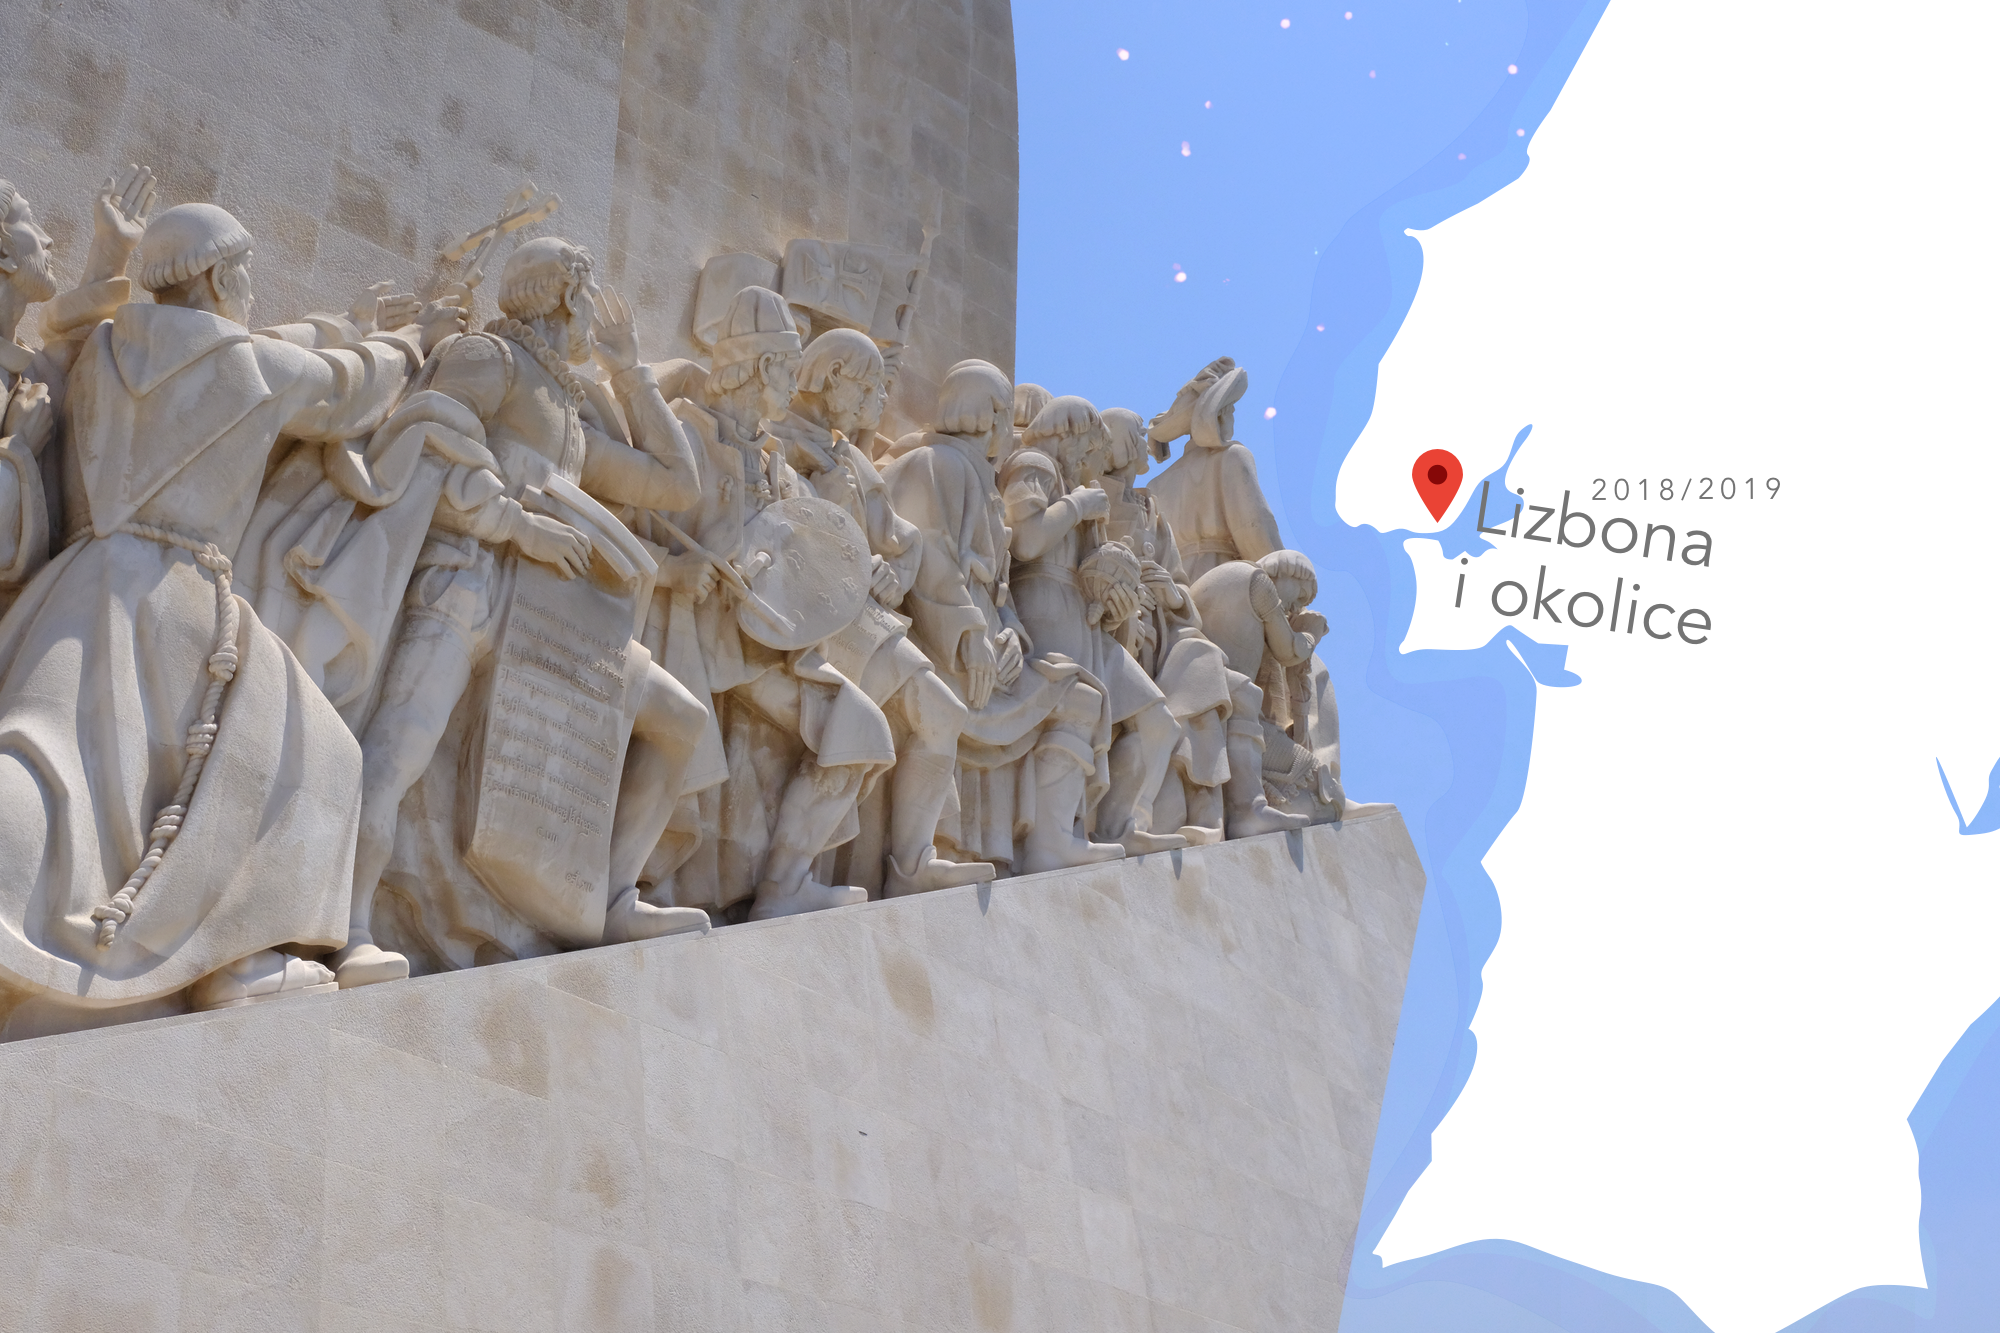 marchewkowa, blog, podróże, urlop, wakacje, Portugalia, Lizbona, Mouraria, fado, travel, Lisboa